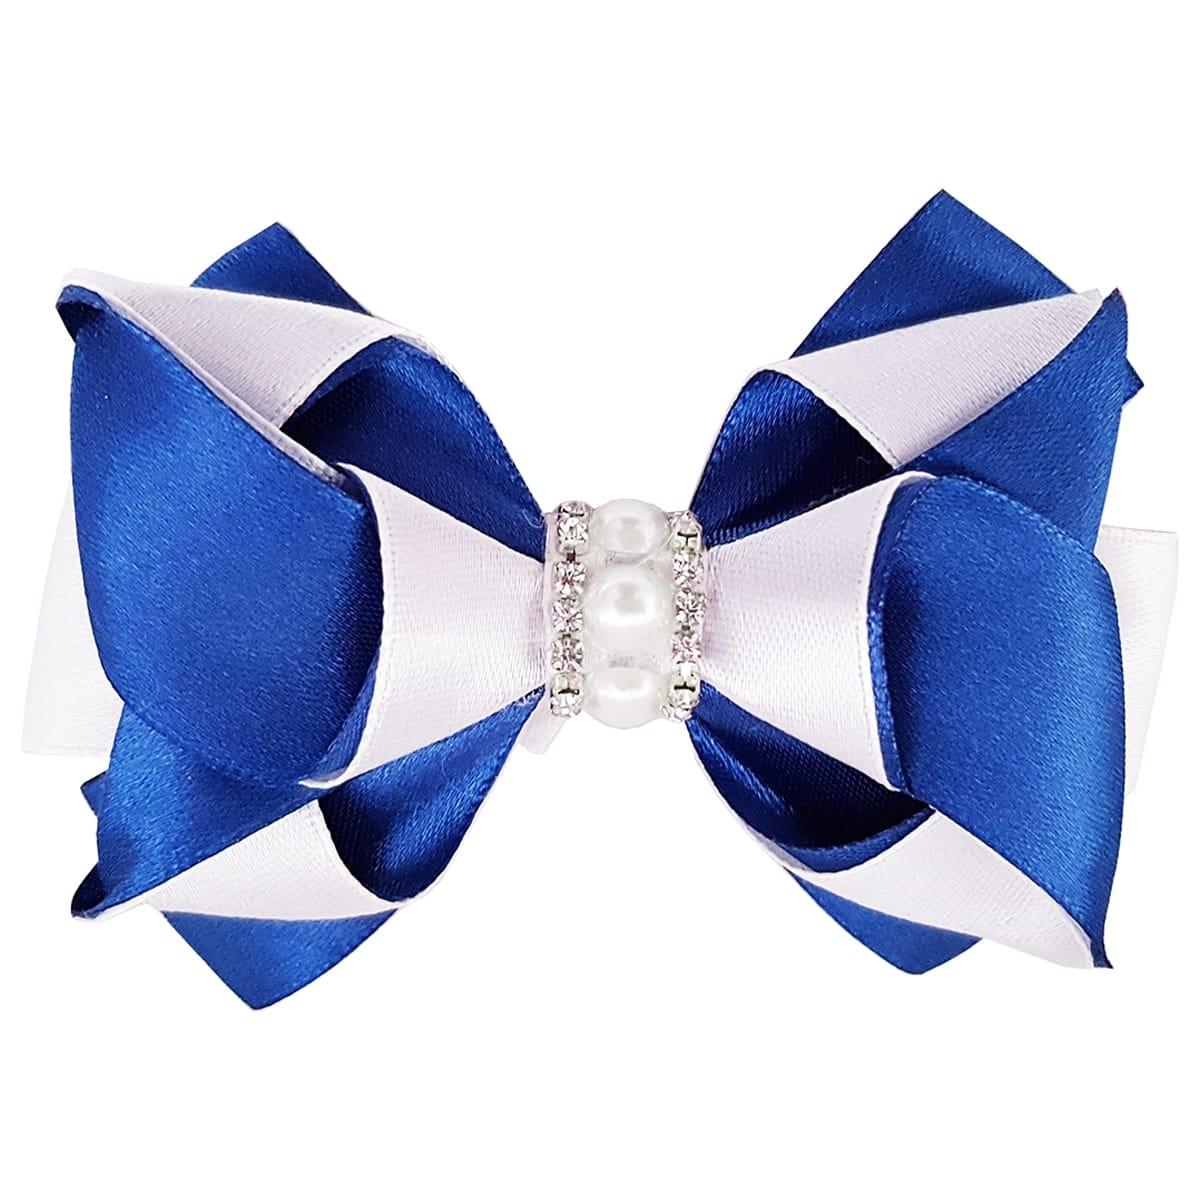 Hair Bow Clip – Blue and White